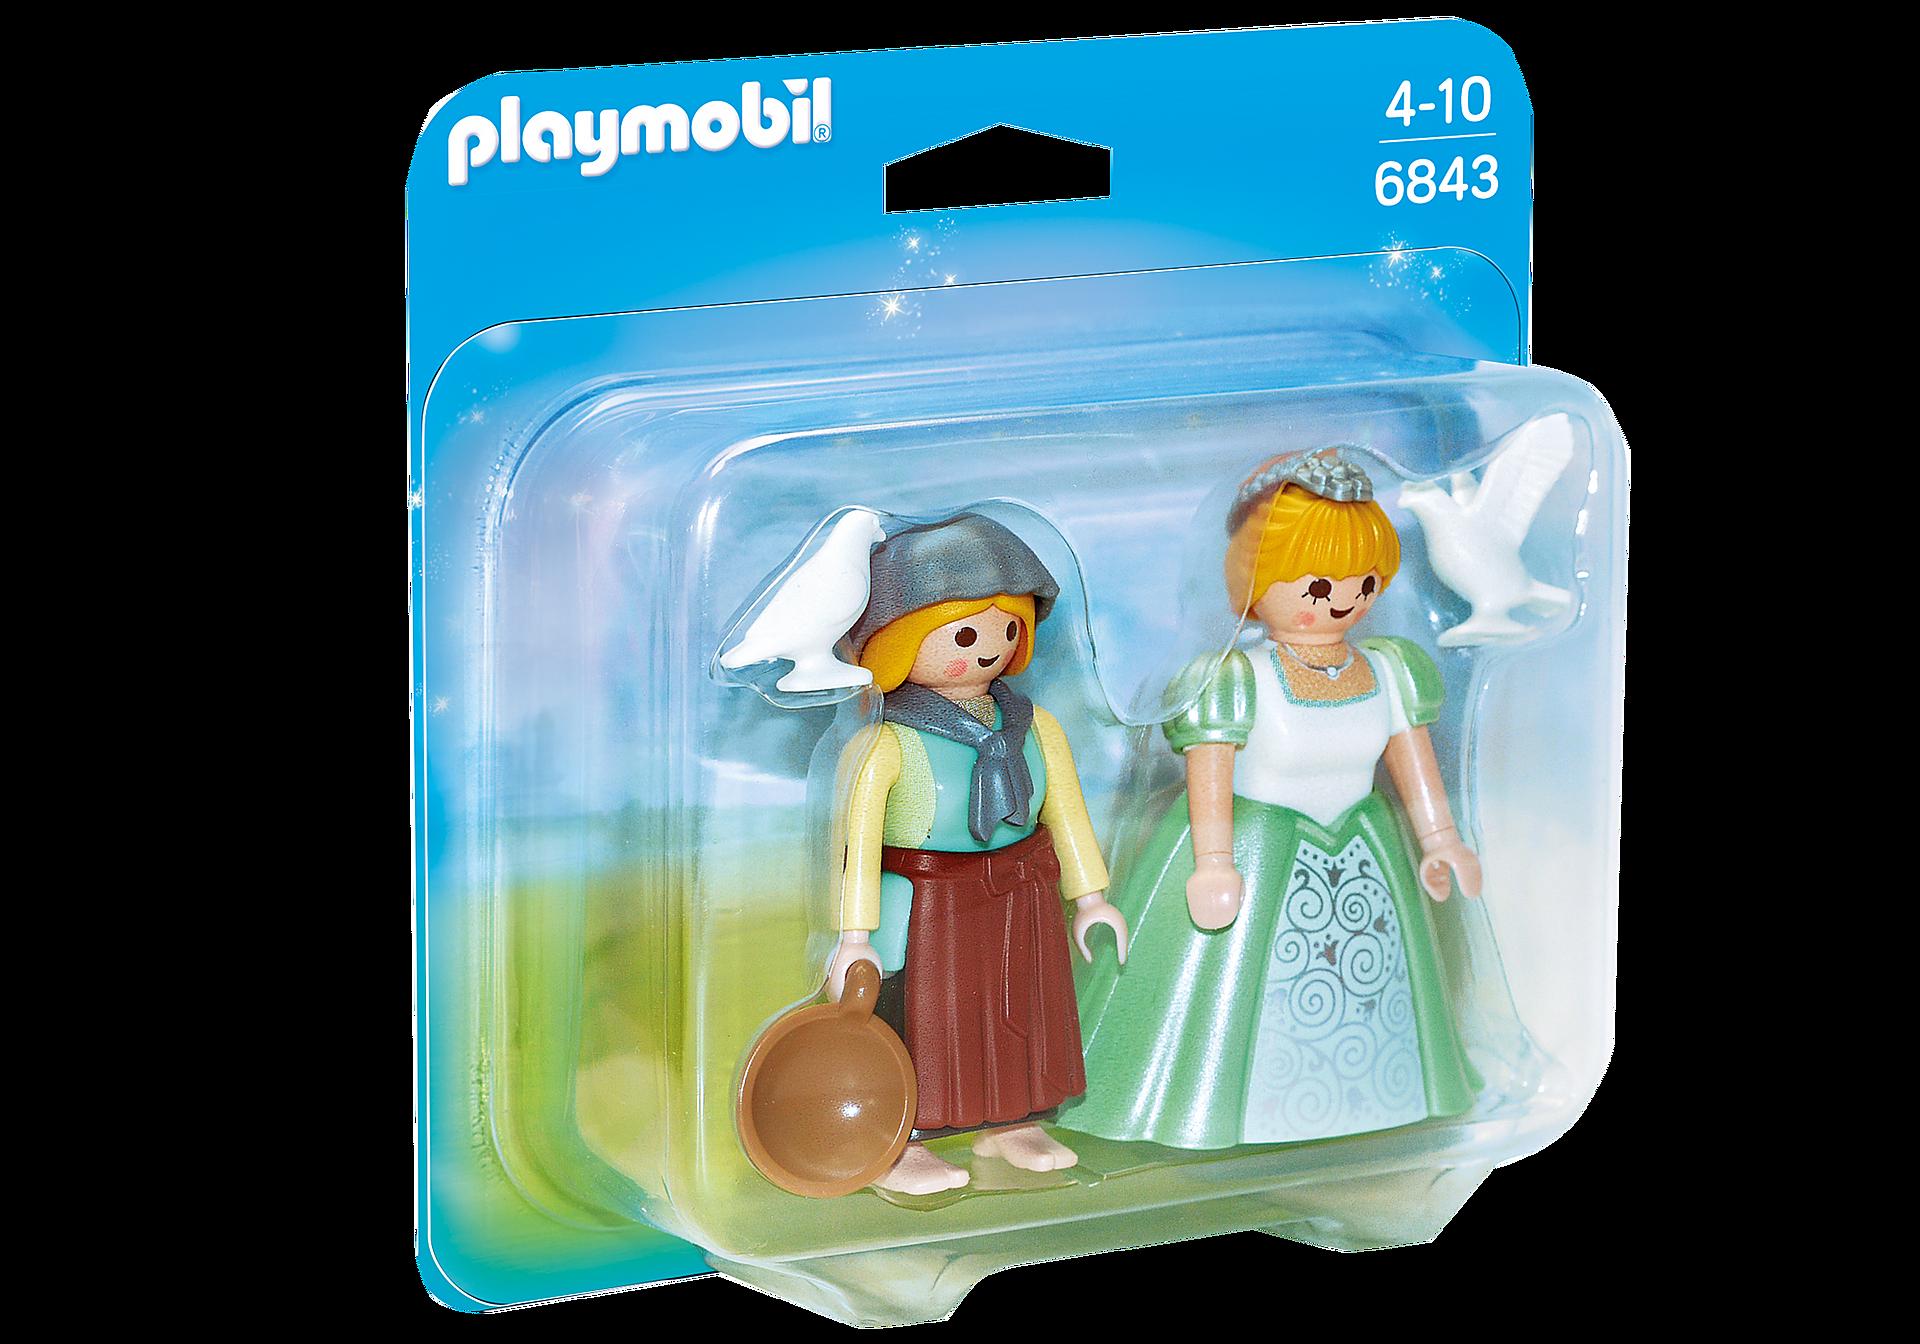 http://media.playmobil.com/i/playmobil/6843_product_box_front/ДУО: Принцесса и служанка